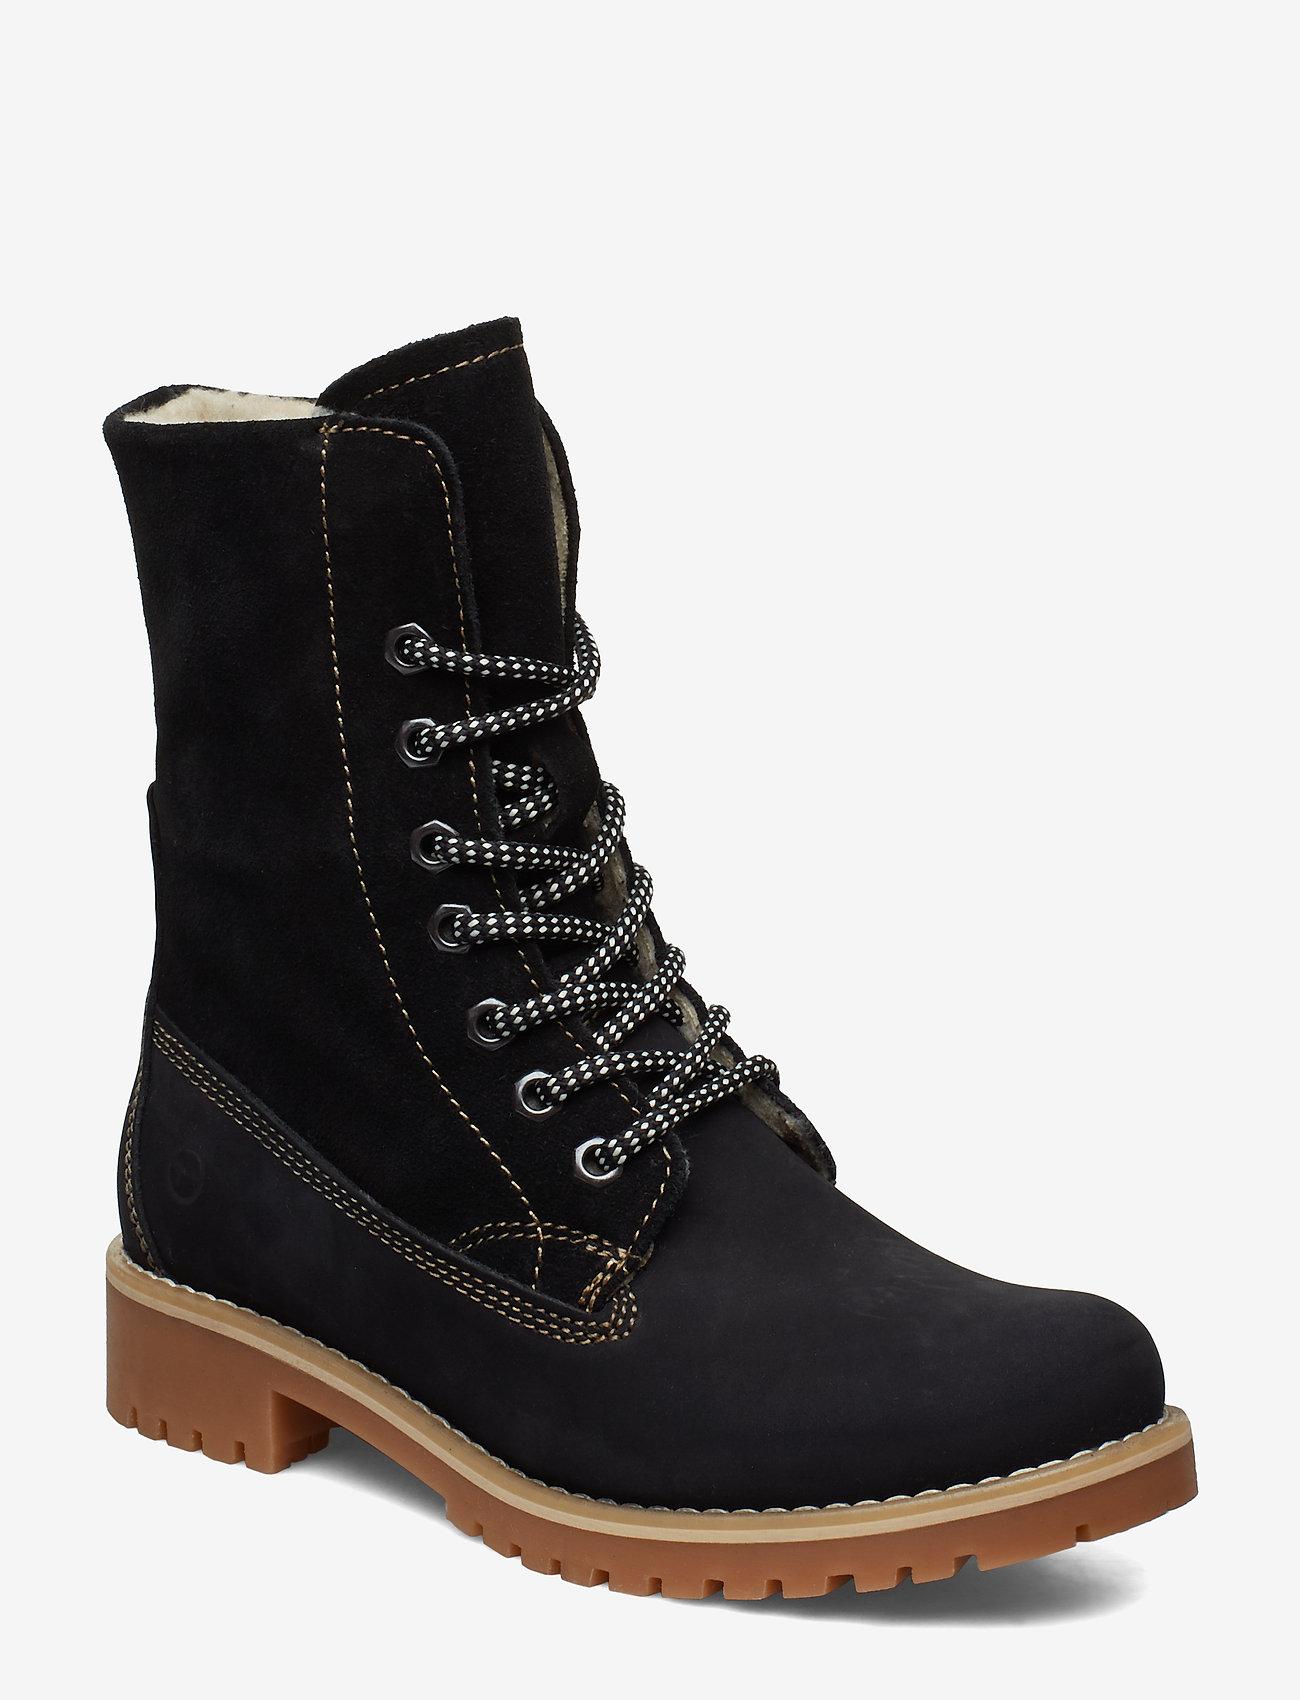 Tamaris - Boots - flache stiefeletten - black - 0